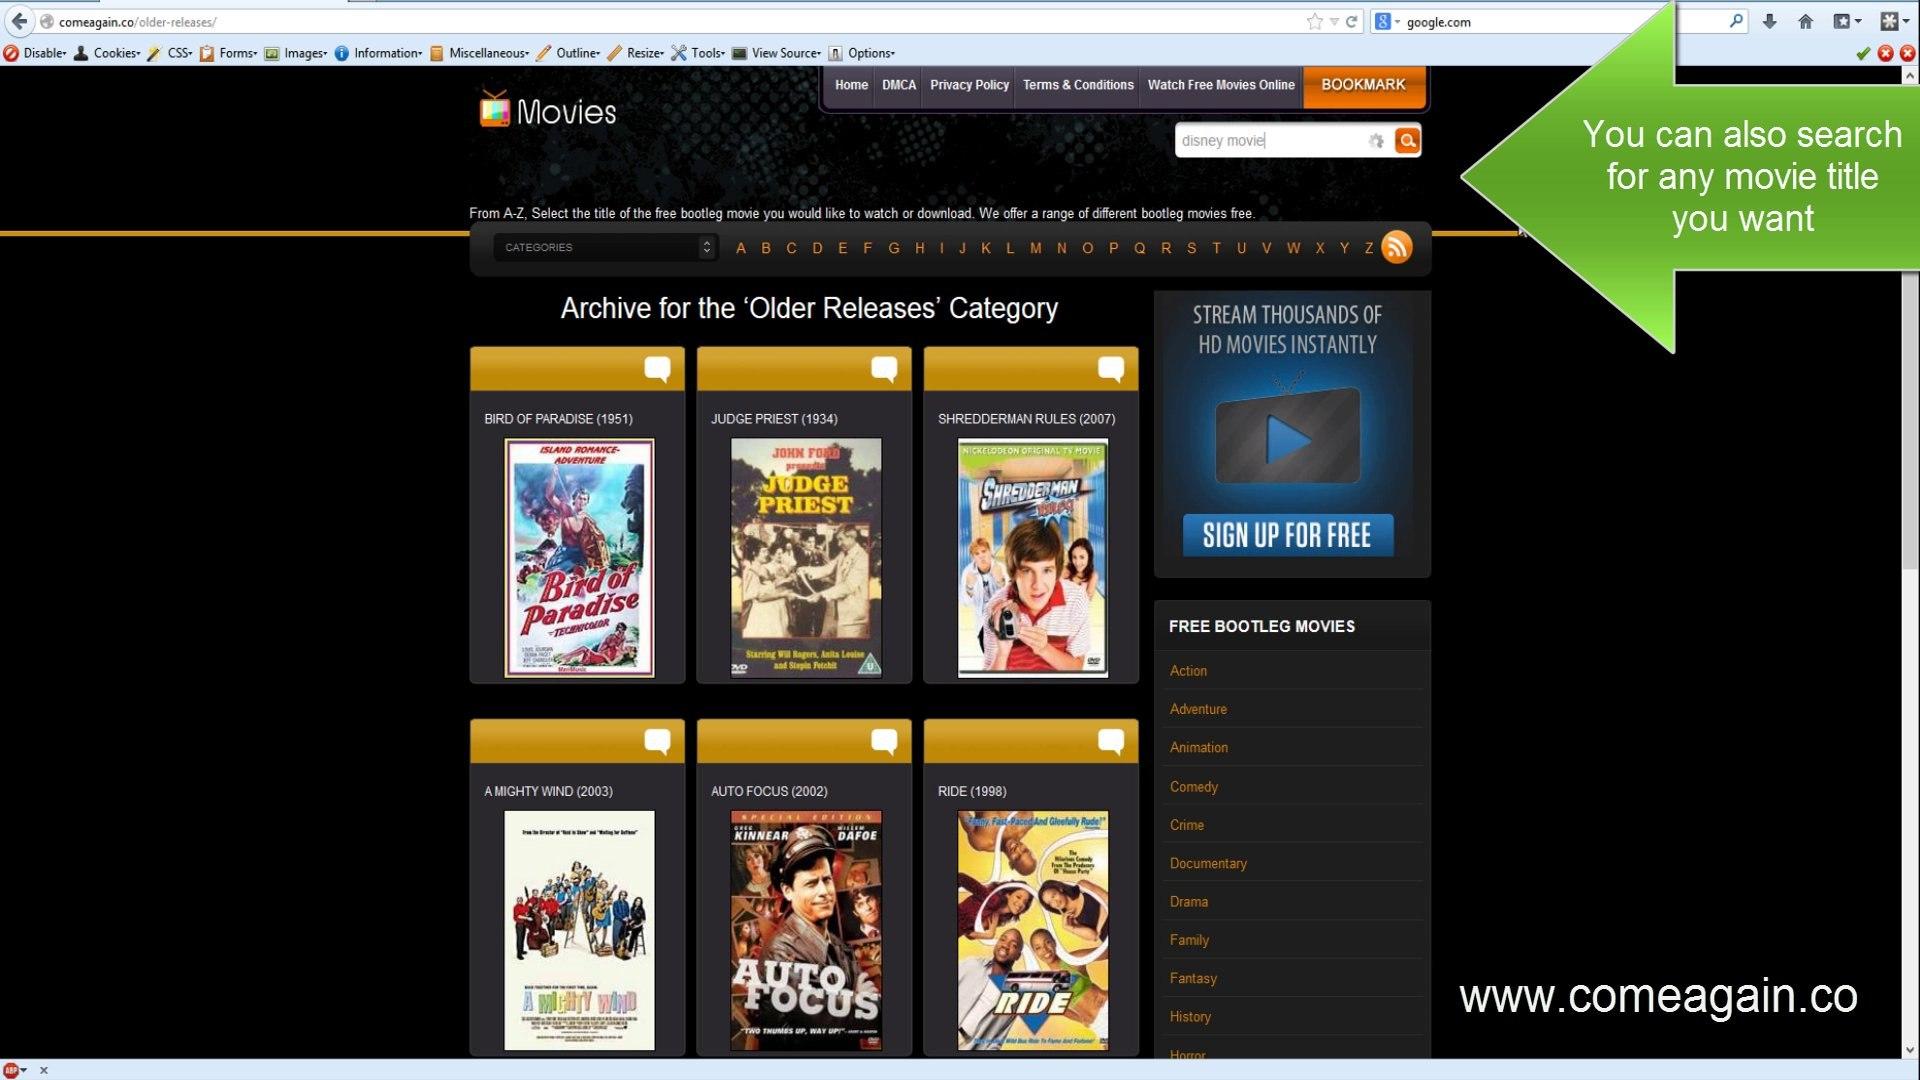 nigerian movies free nollywood movies